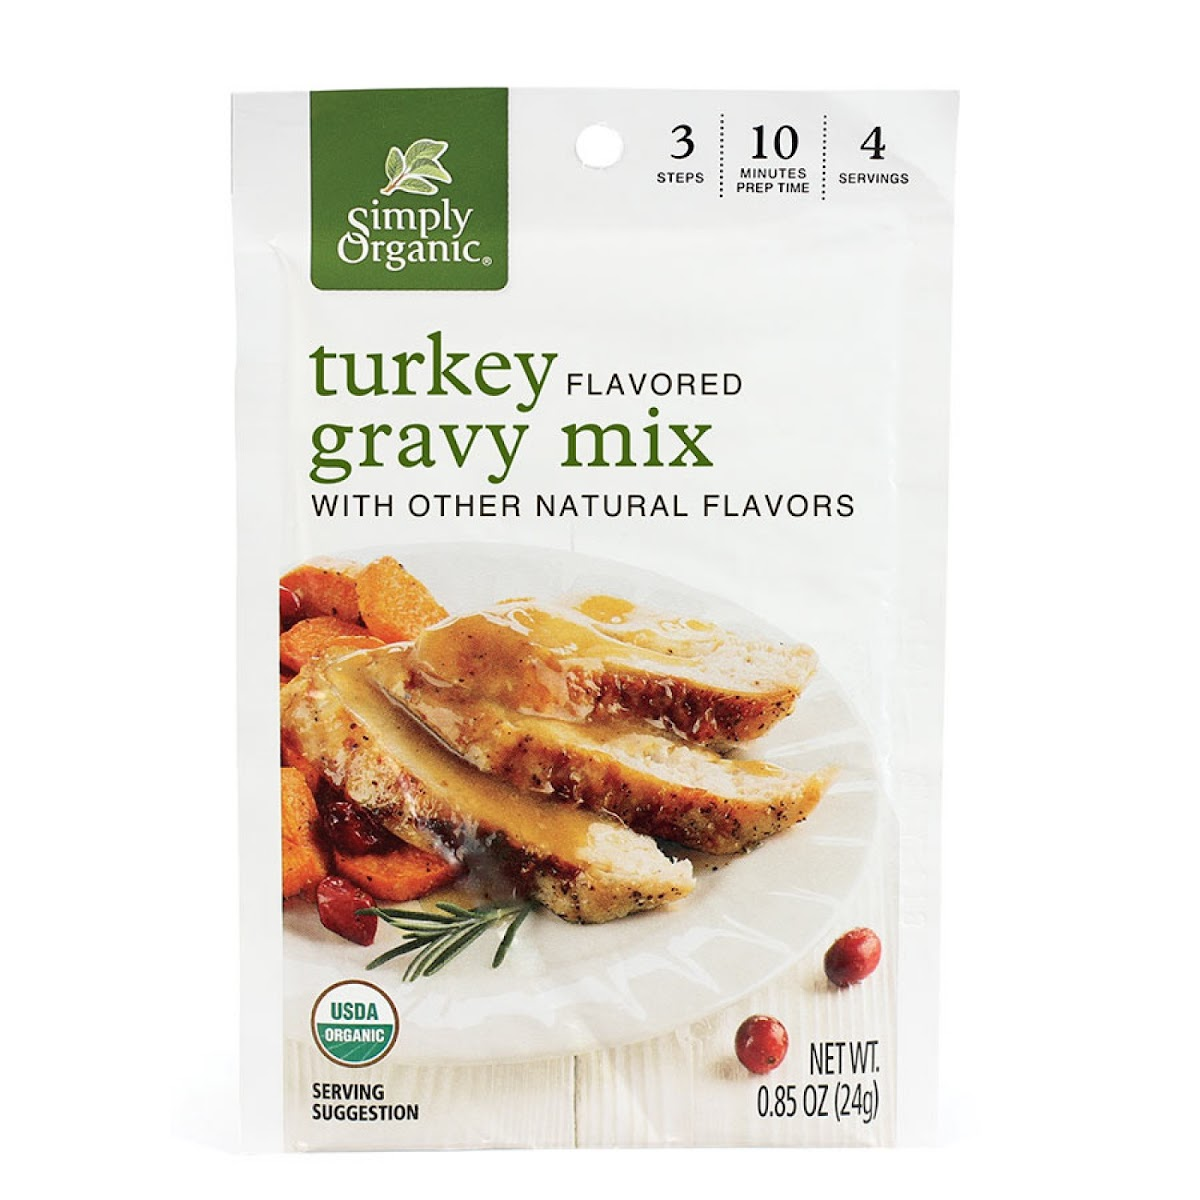 Roasted Turkey Flavored Gravy Mix